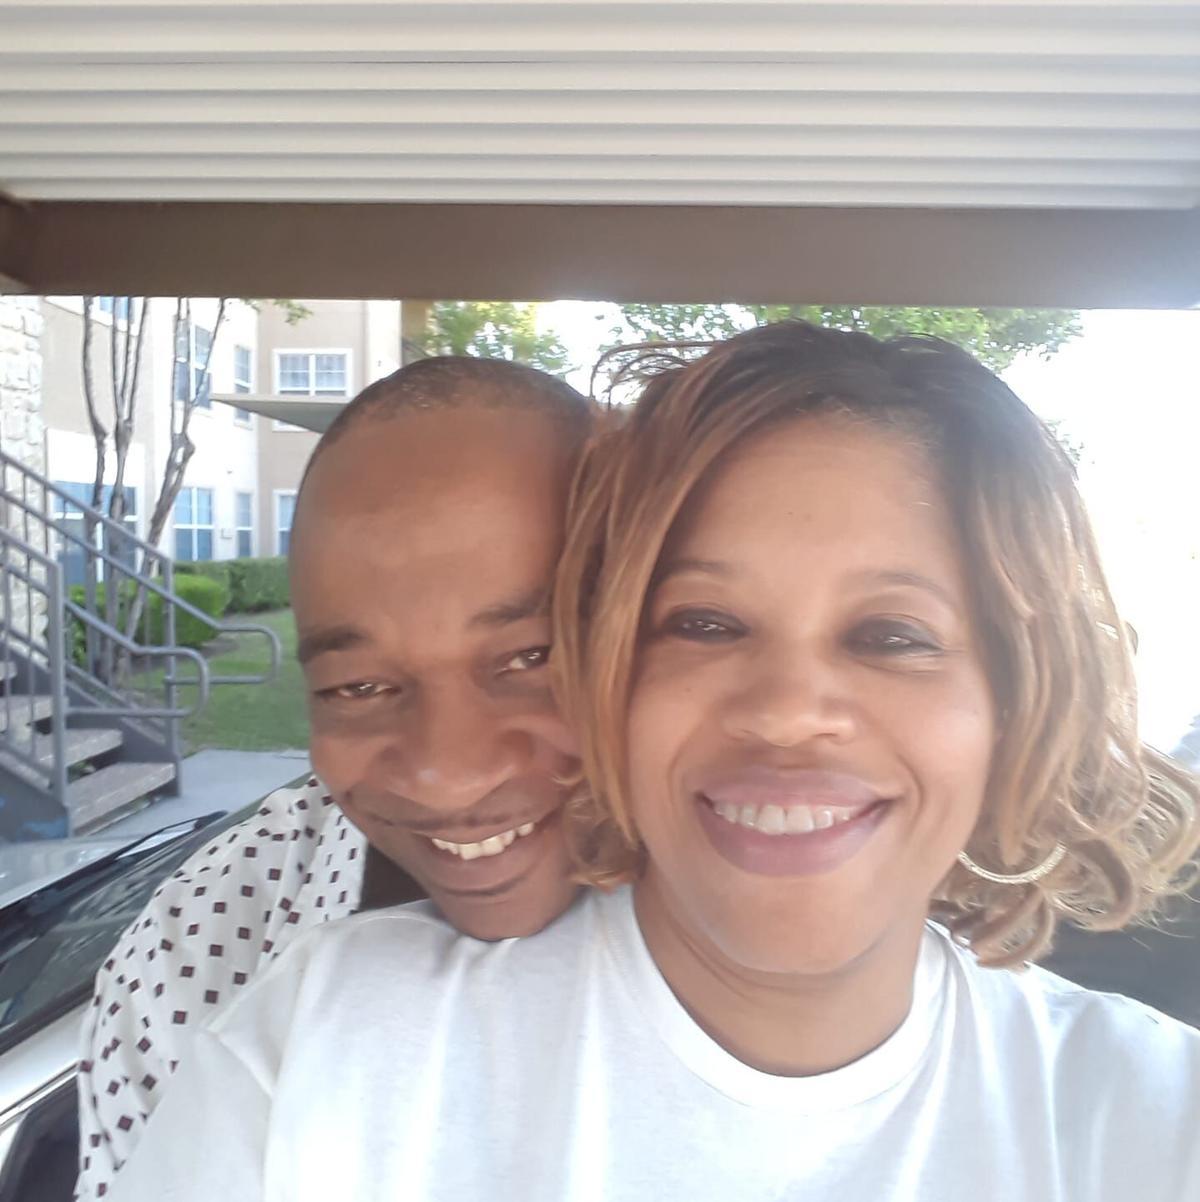 Sonya Duckett and husband Anthony Duckett